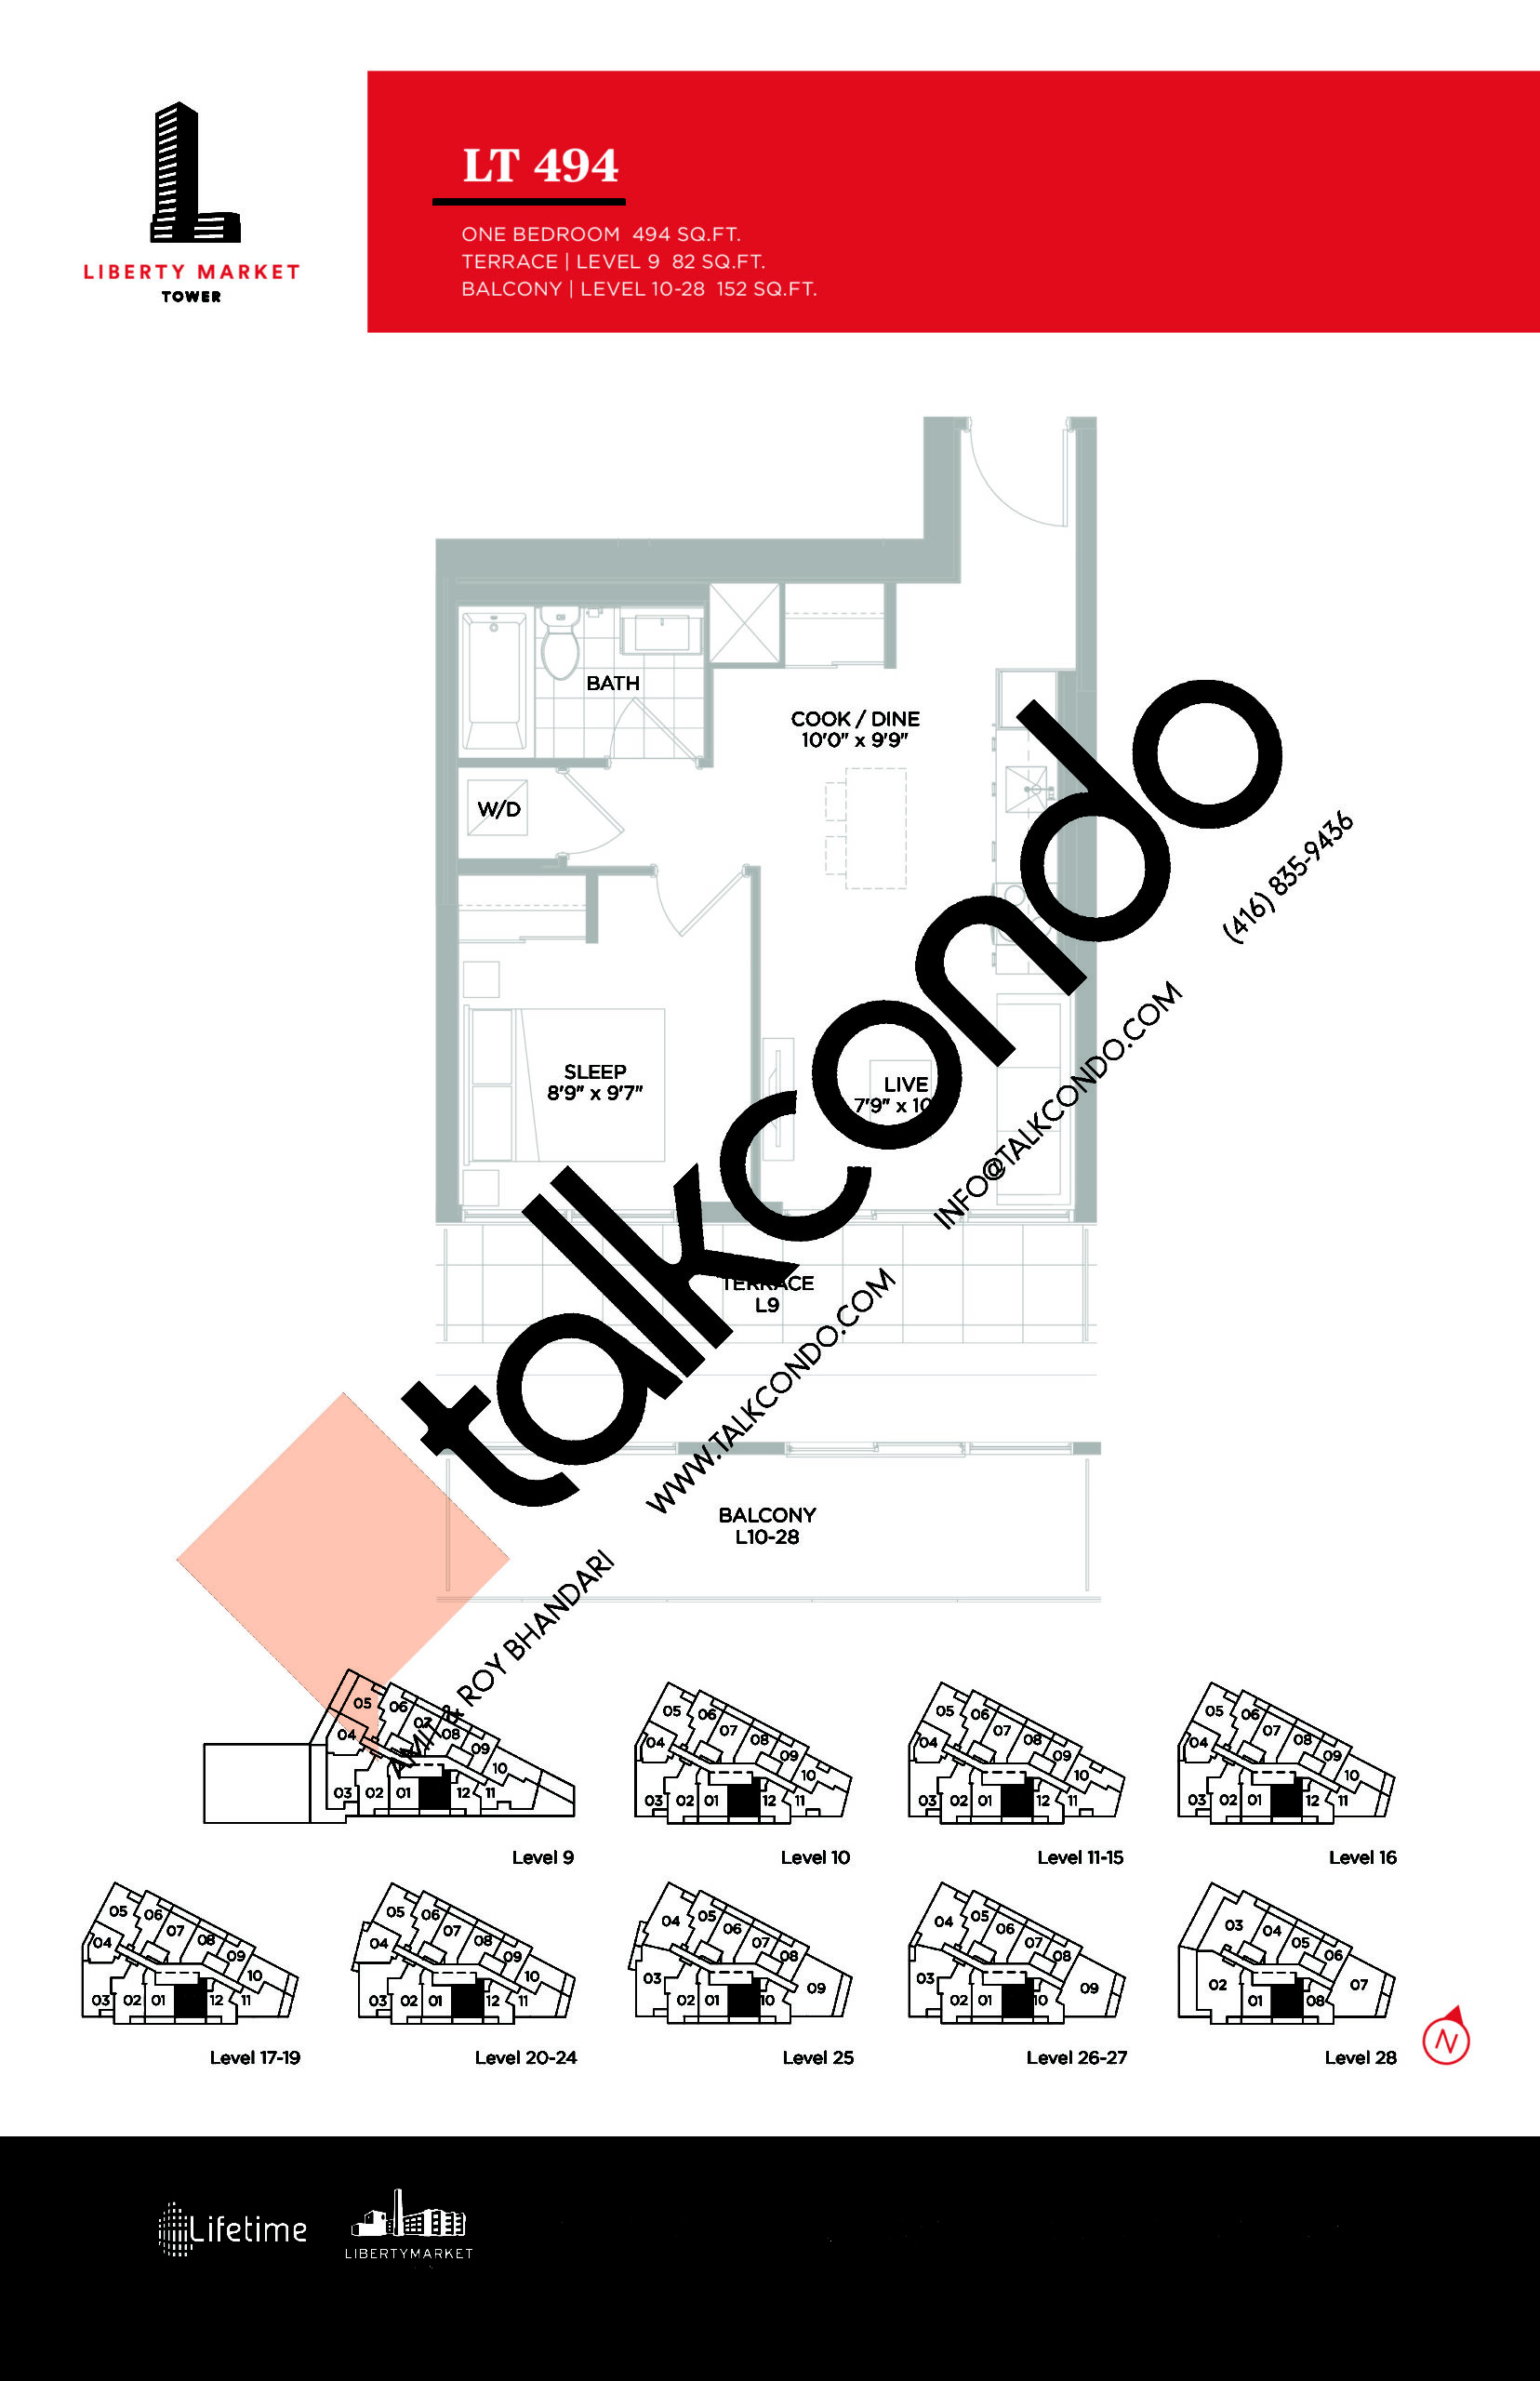 LT 494 Floor Plan at Liberty Market Tower Condos - 494 sq.ft